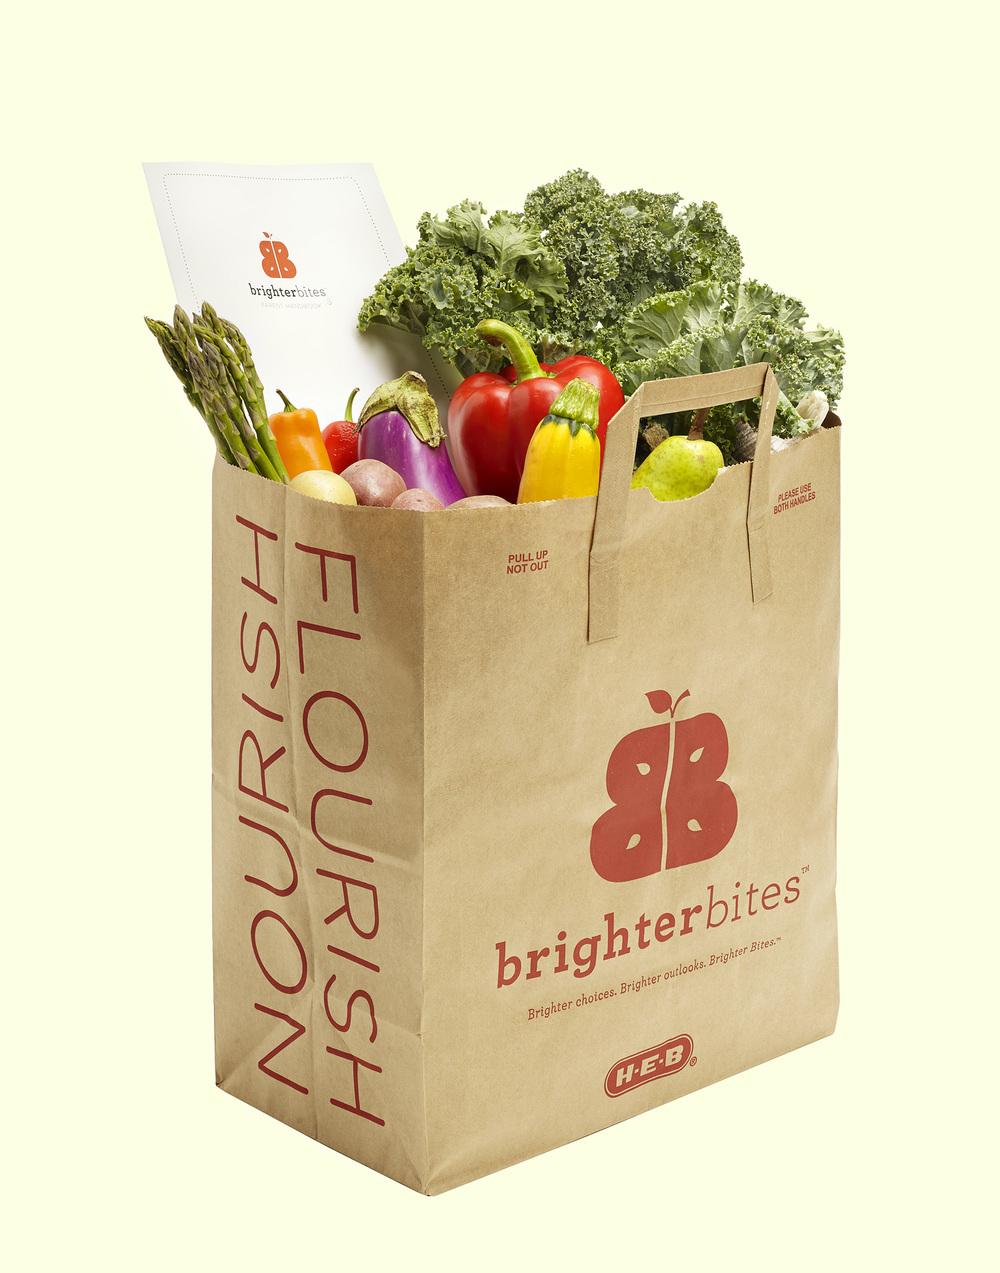 Brighter Bites Bag of Groceries